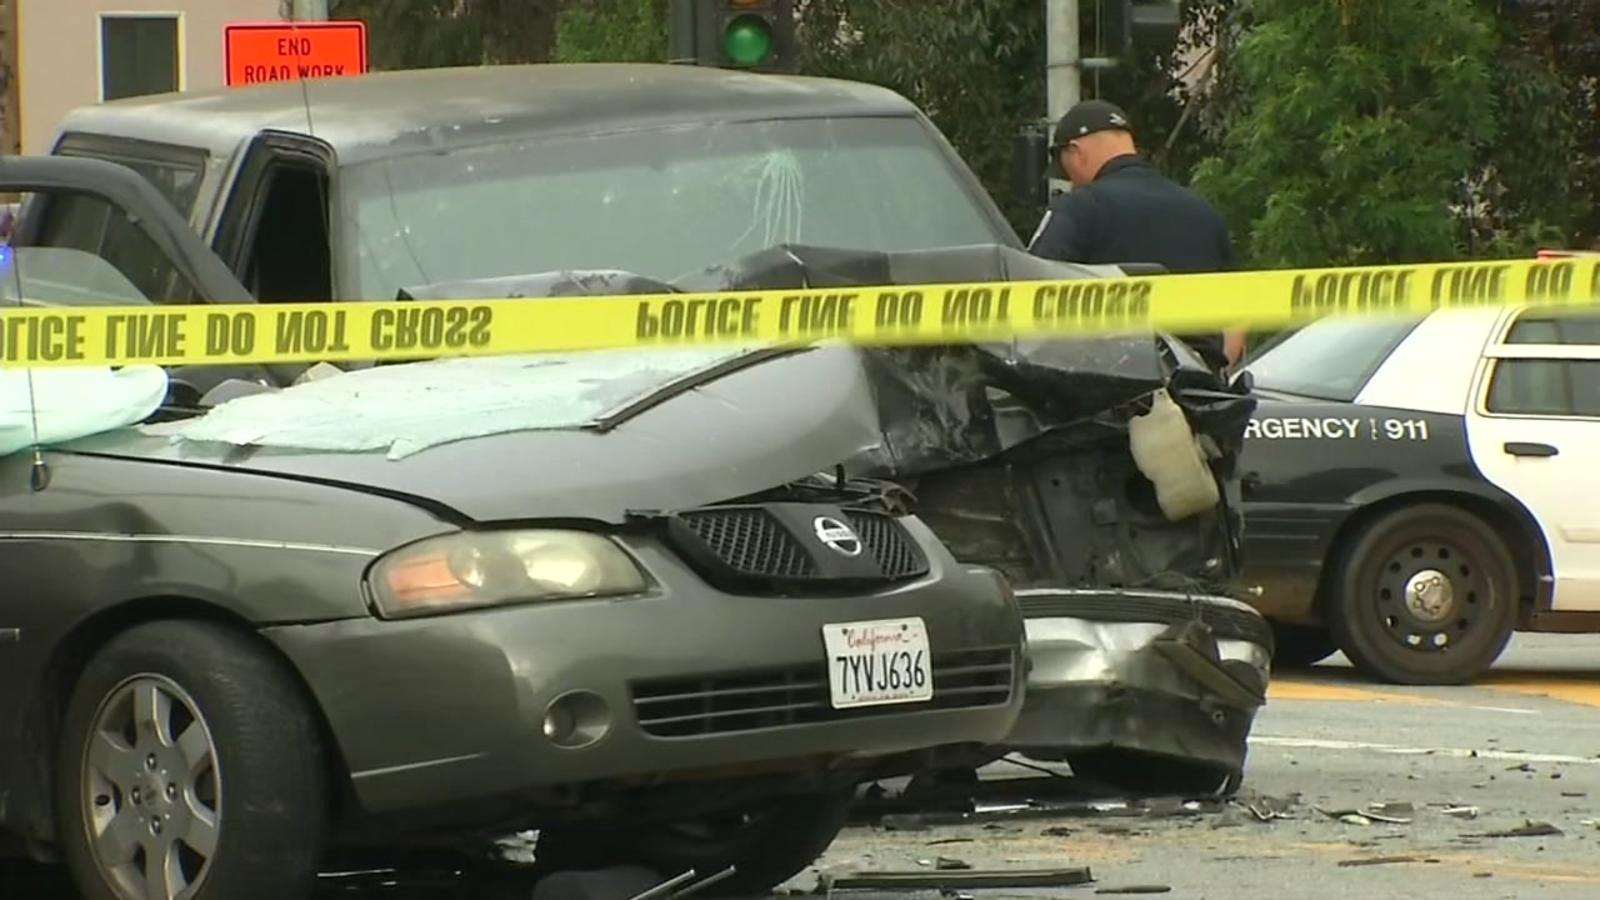 1 dead, 2 injured after crash outside Presidio in San Francisco